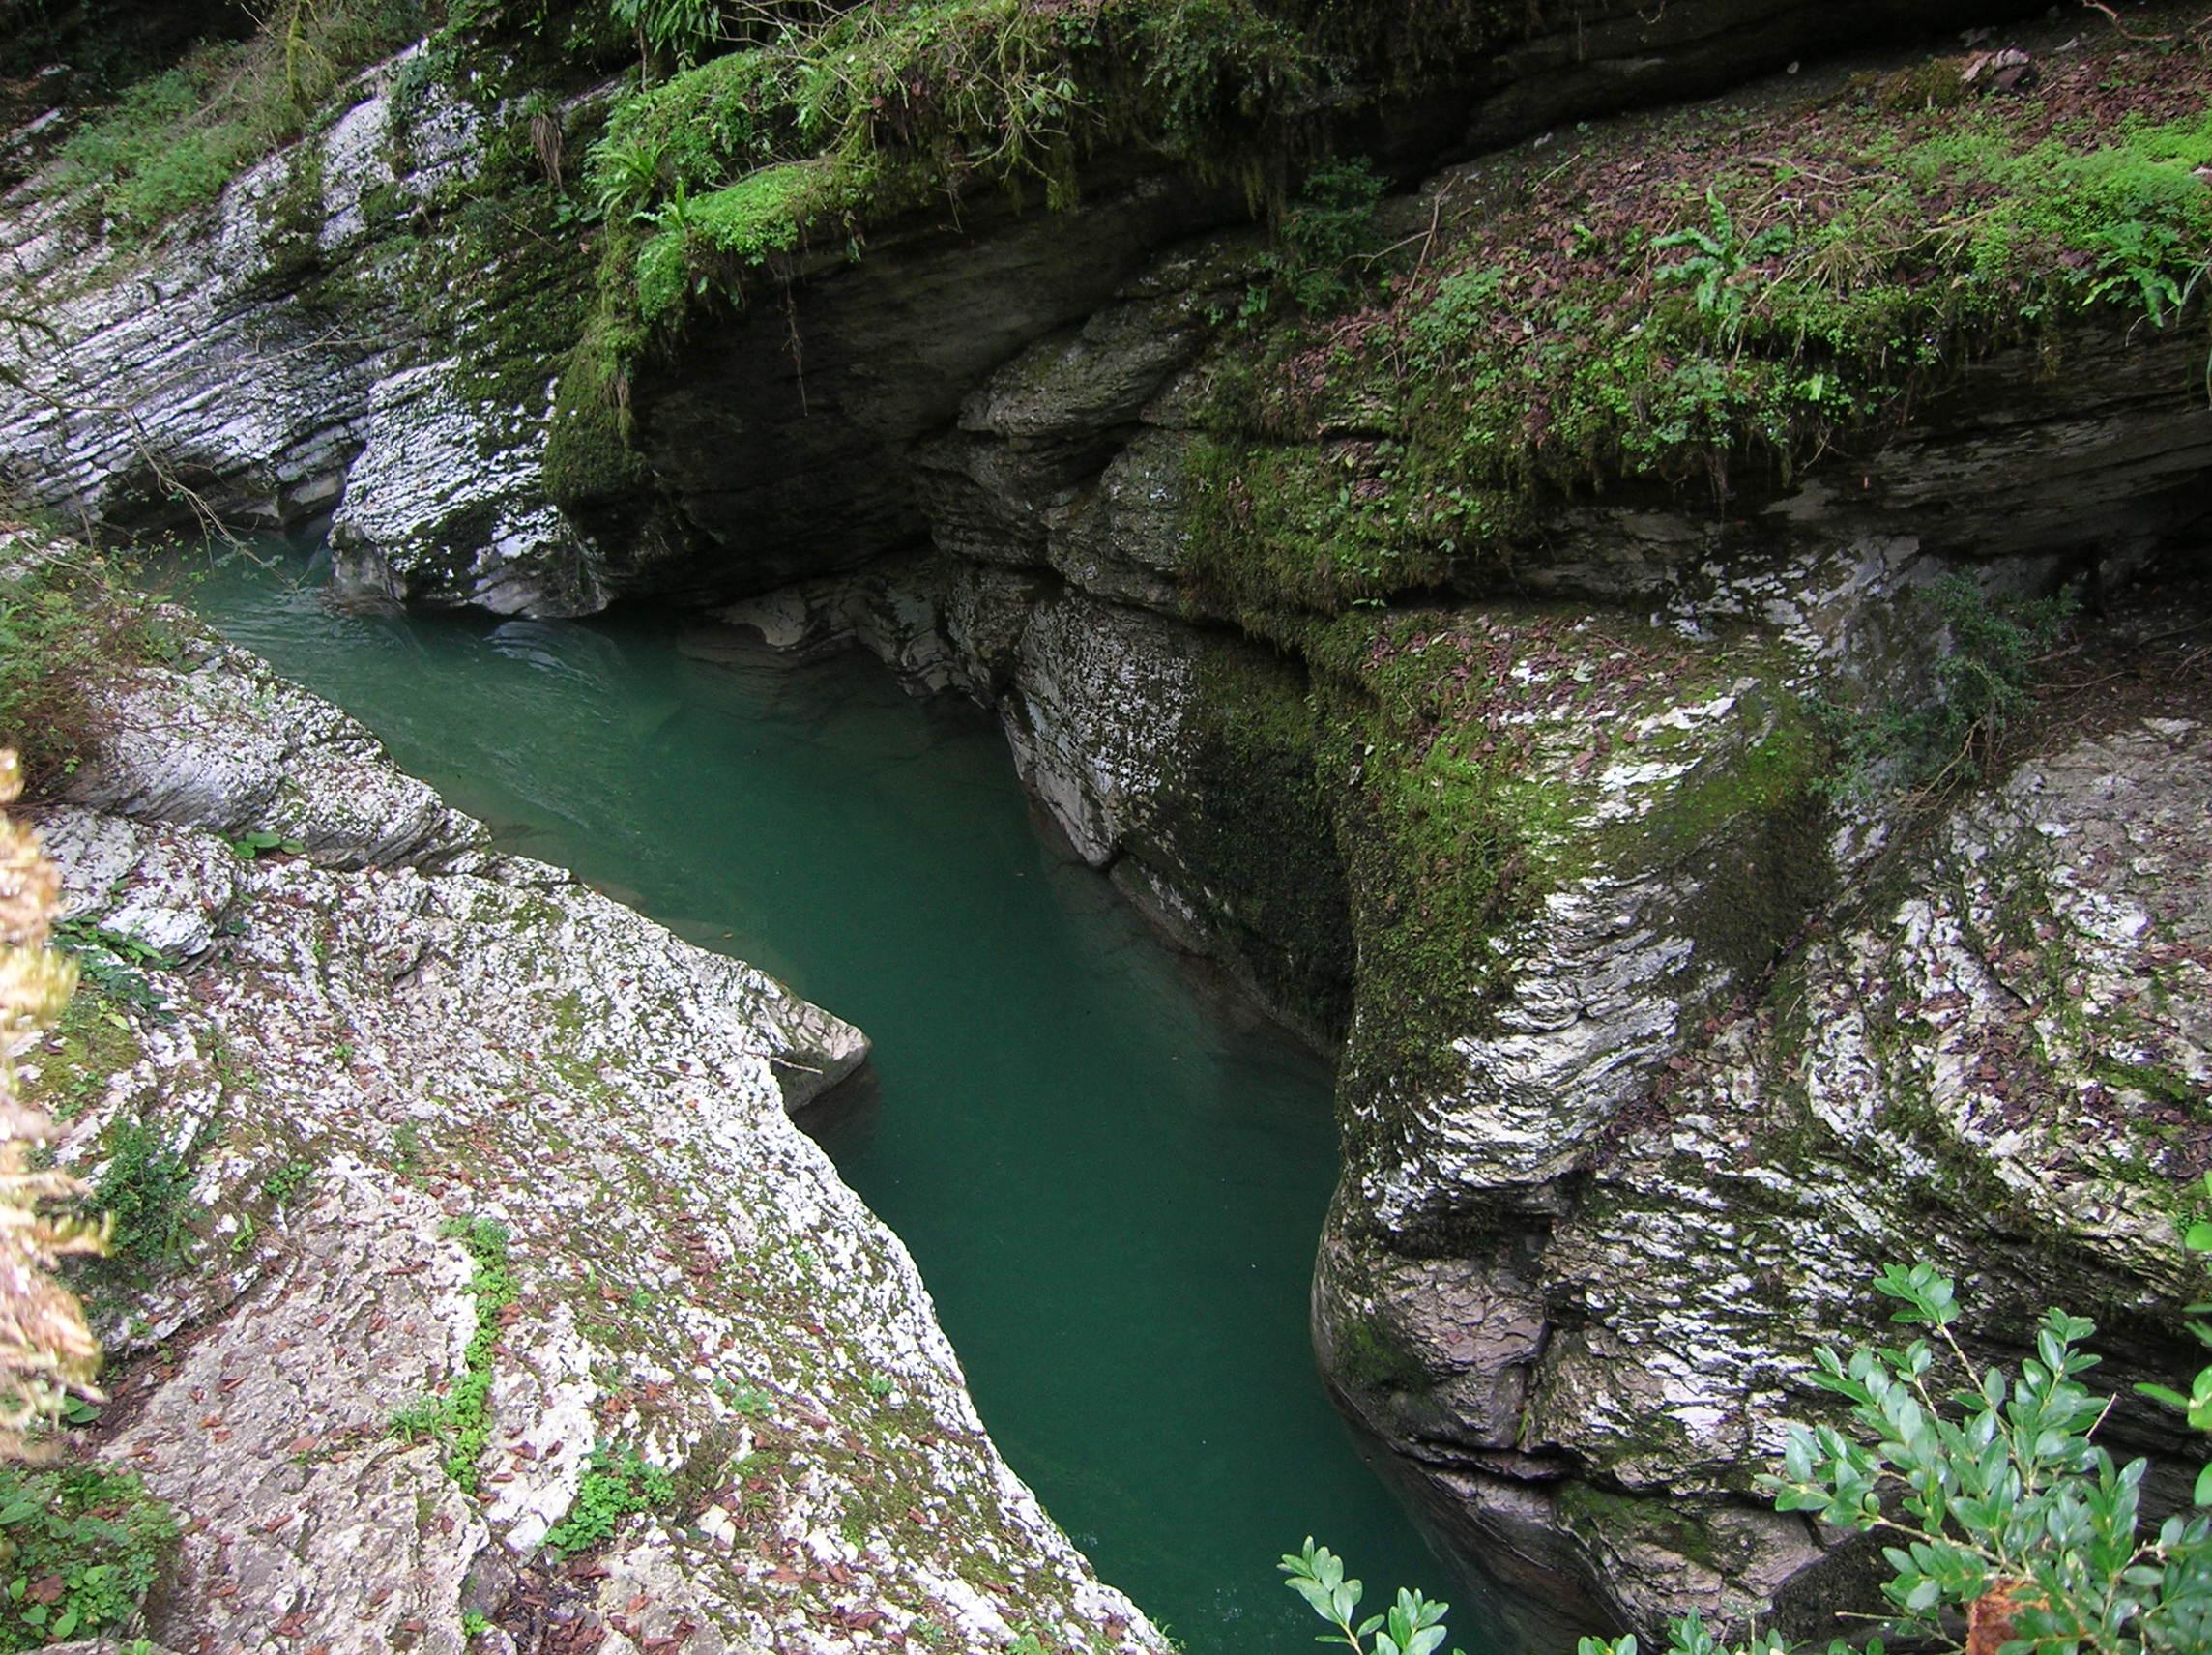 Каньон реки Псахо. Блиц: все зеленое